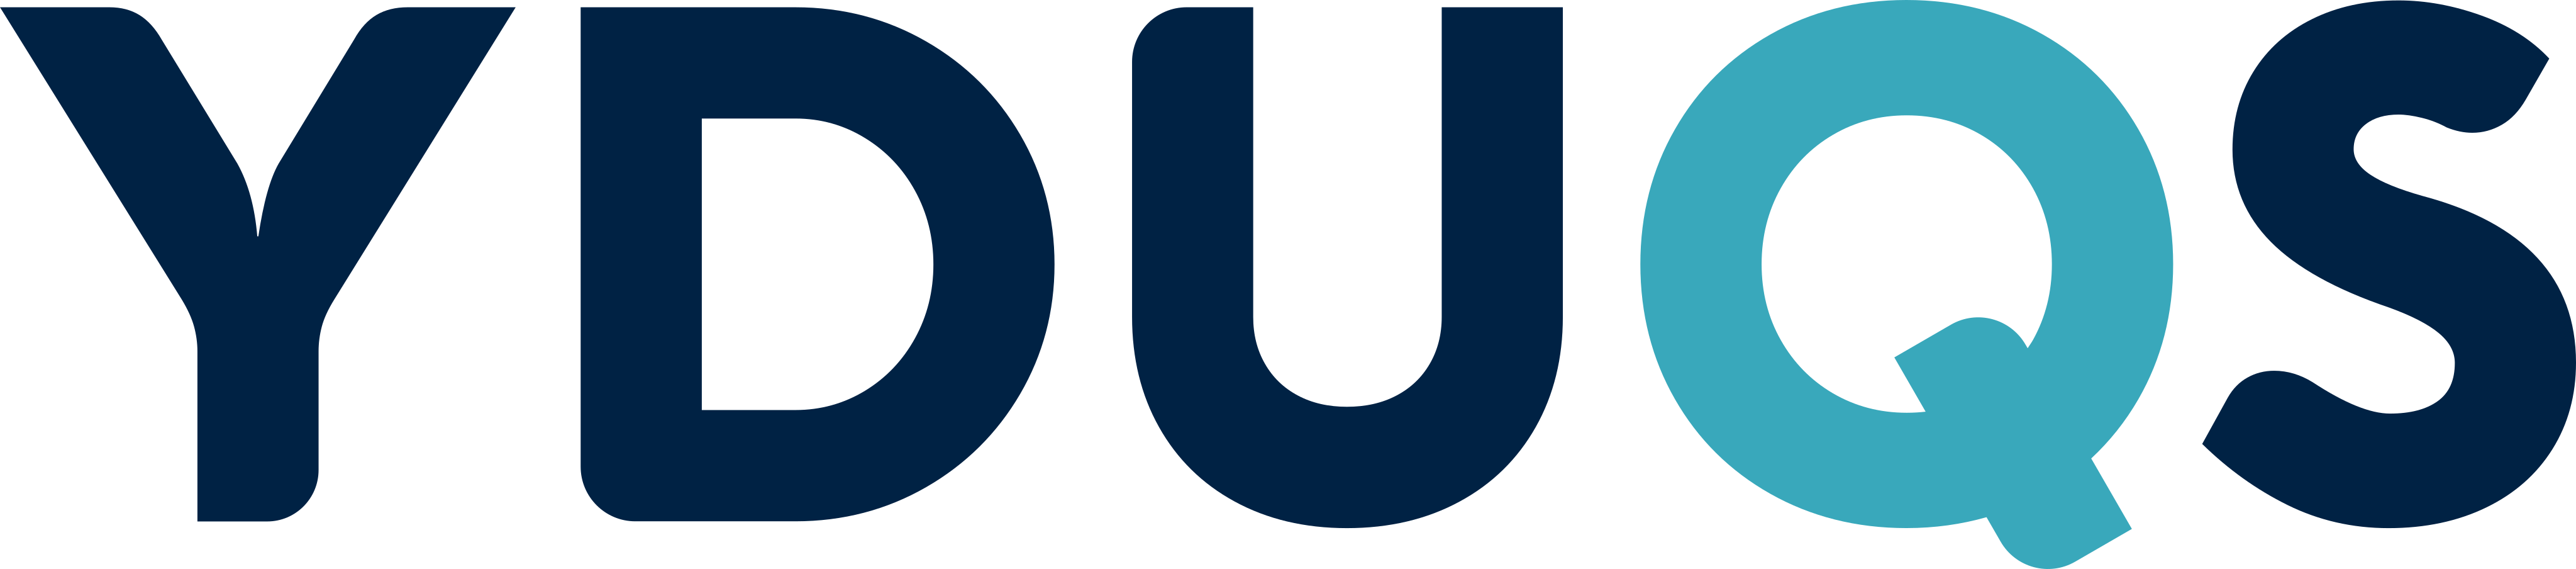 yduqs logo - YDUQS Logo